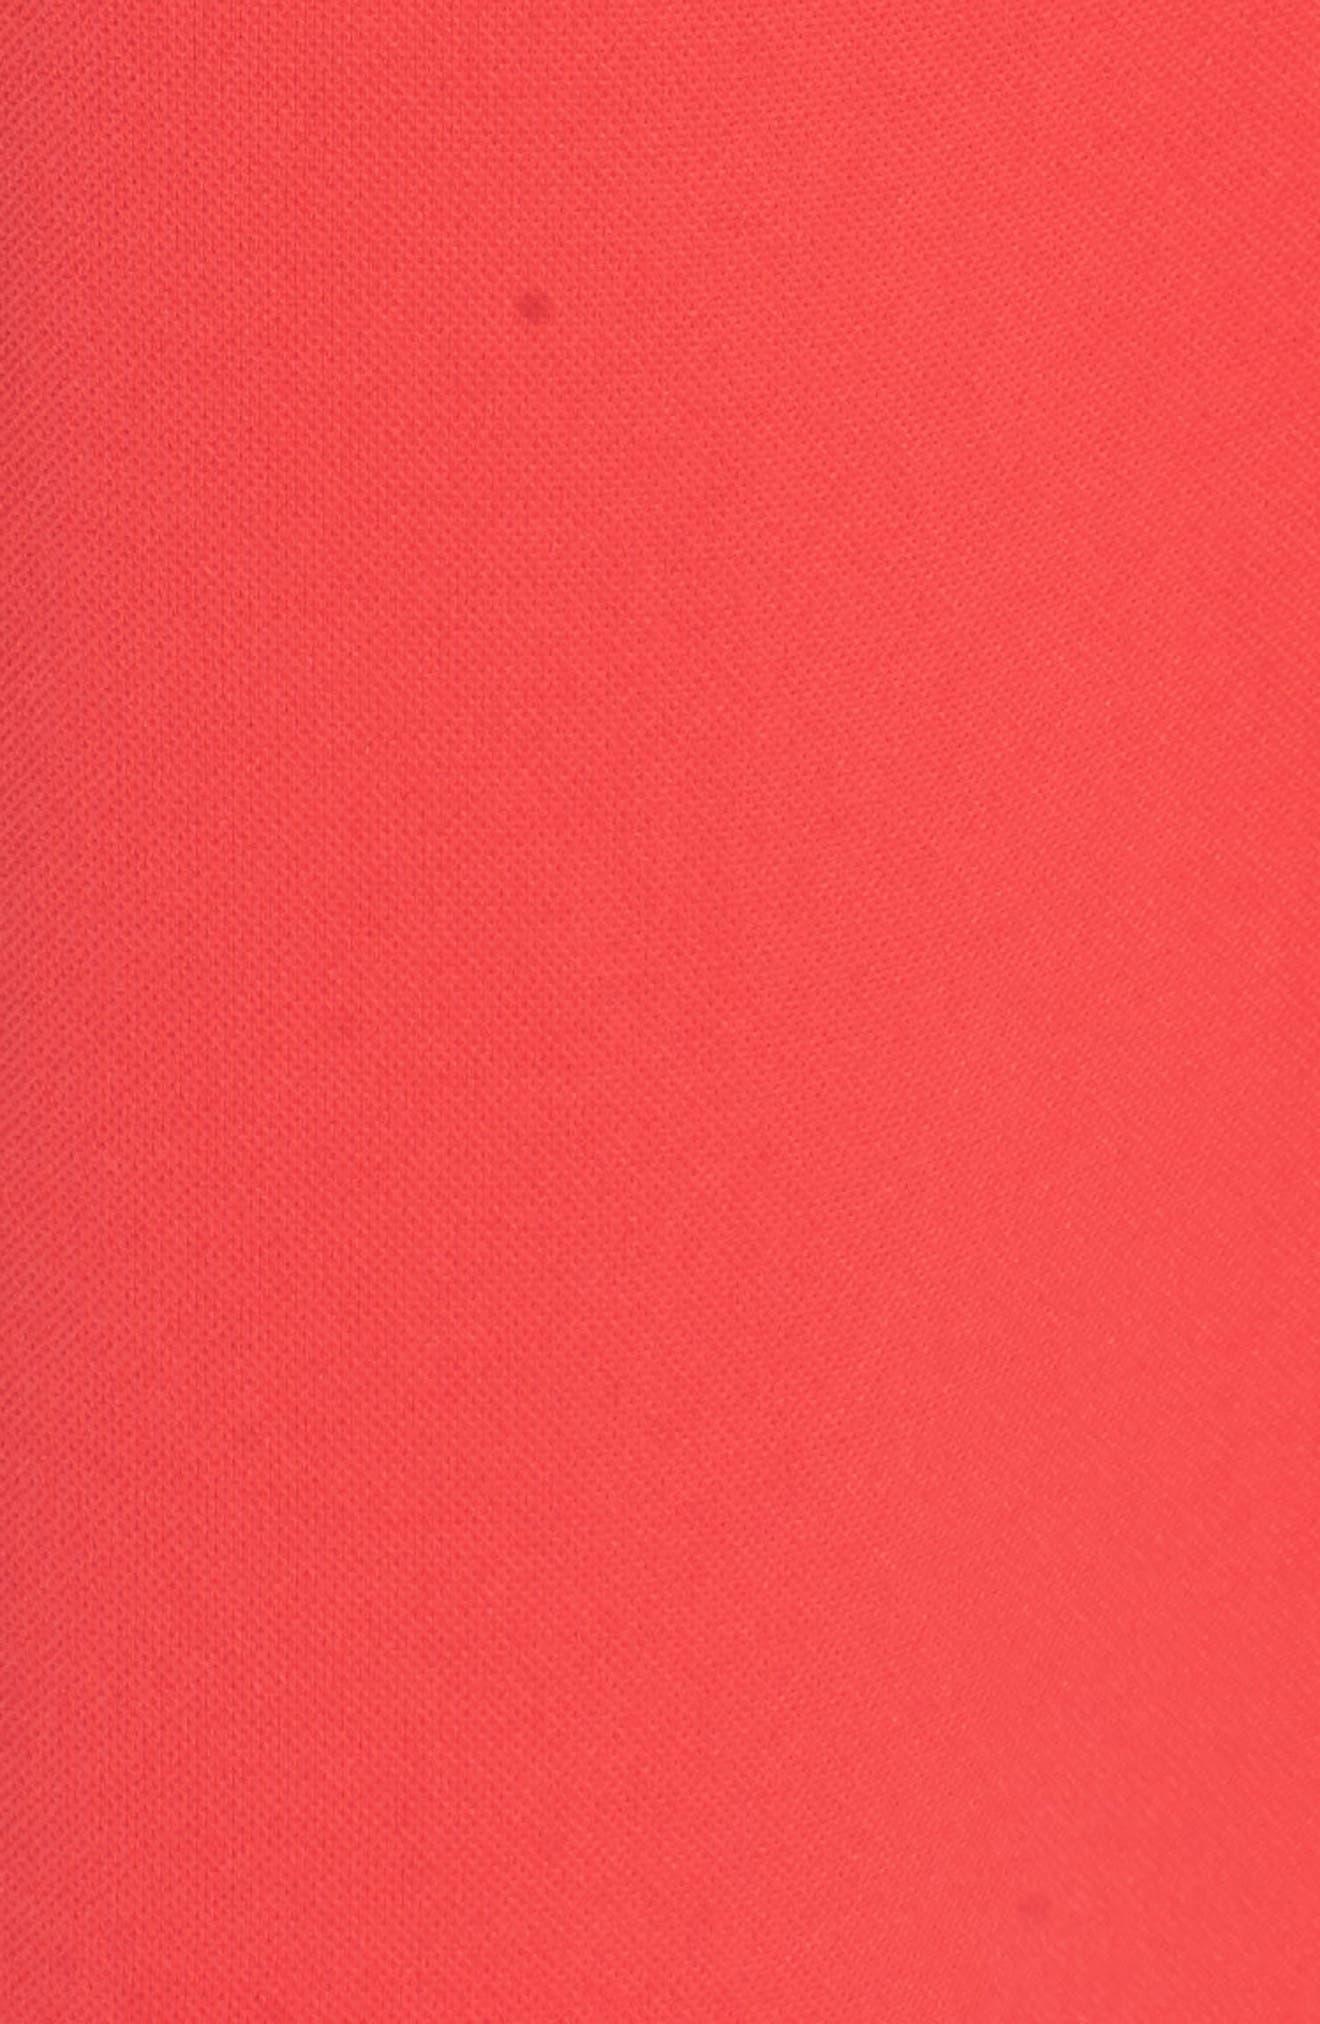 ADRIANNA PAPELL, Crepe Shift Dress, Alternate thumbnail 6, color, 650